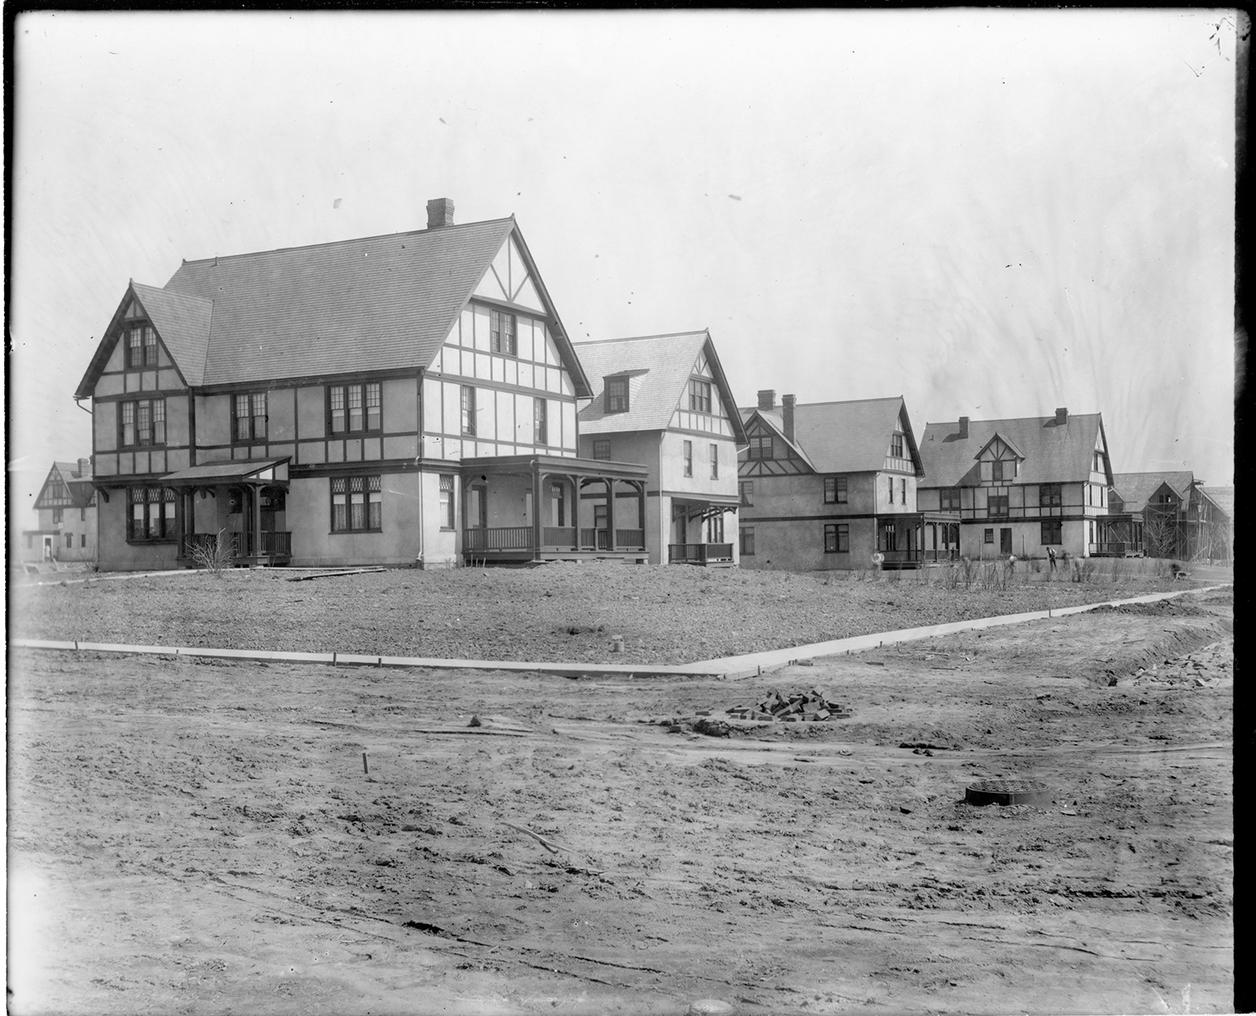 Black and white photo of housing development in Princeton NJ